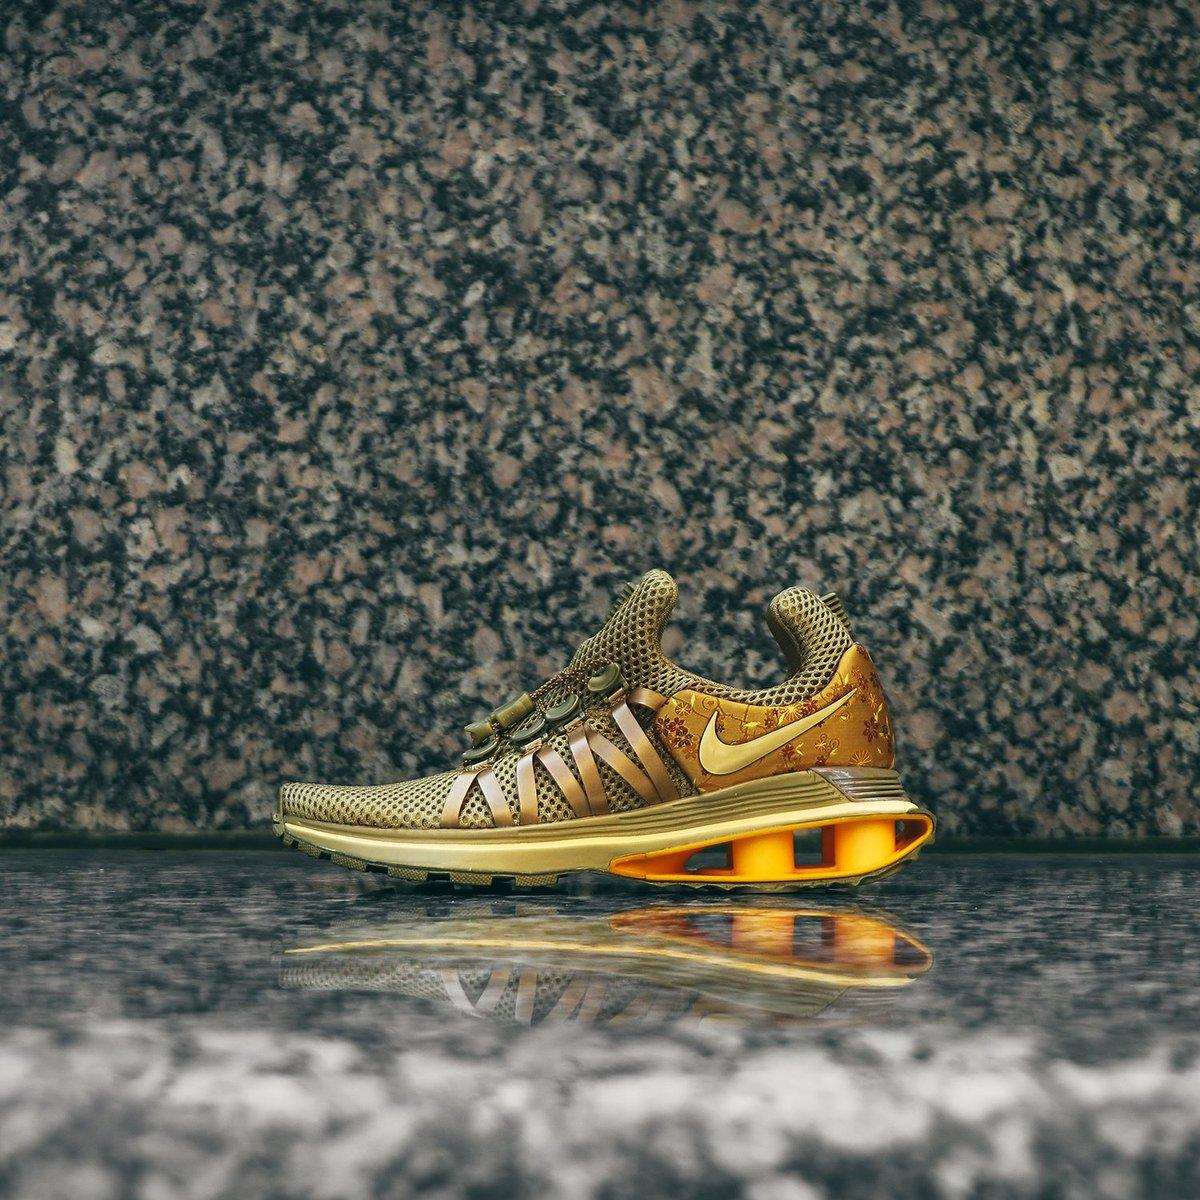 Metallic Gold' Nike Shox Gravity